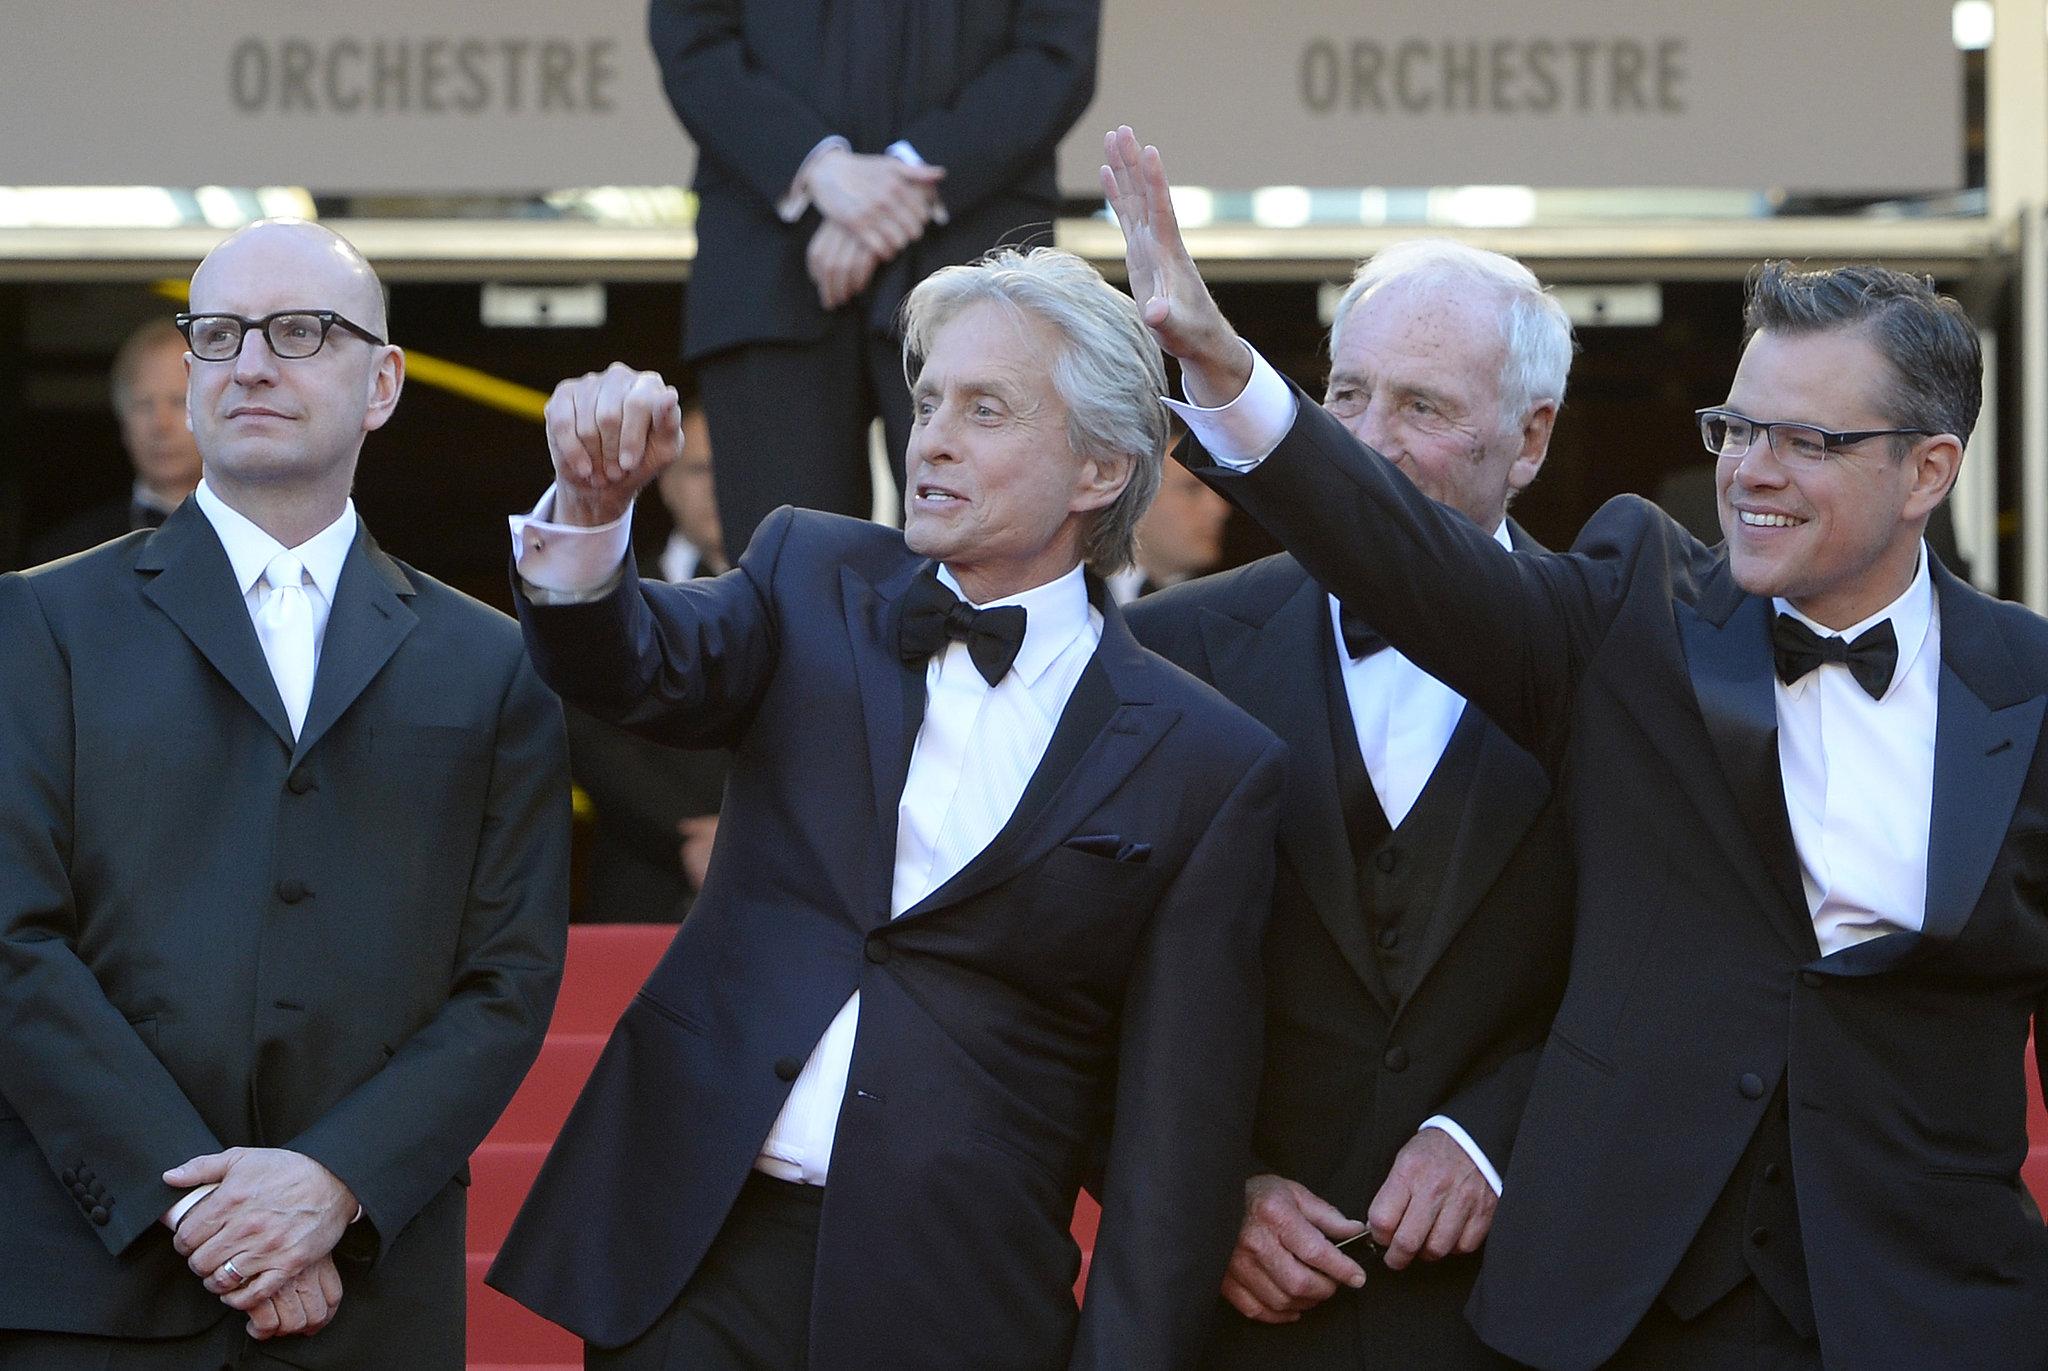 Matt Damon and Michael Douglas waved to the crowd.